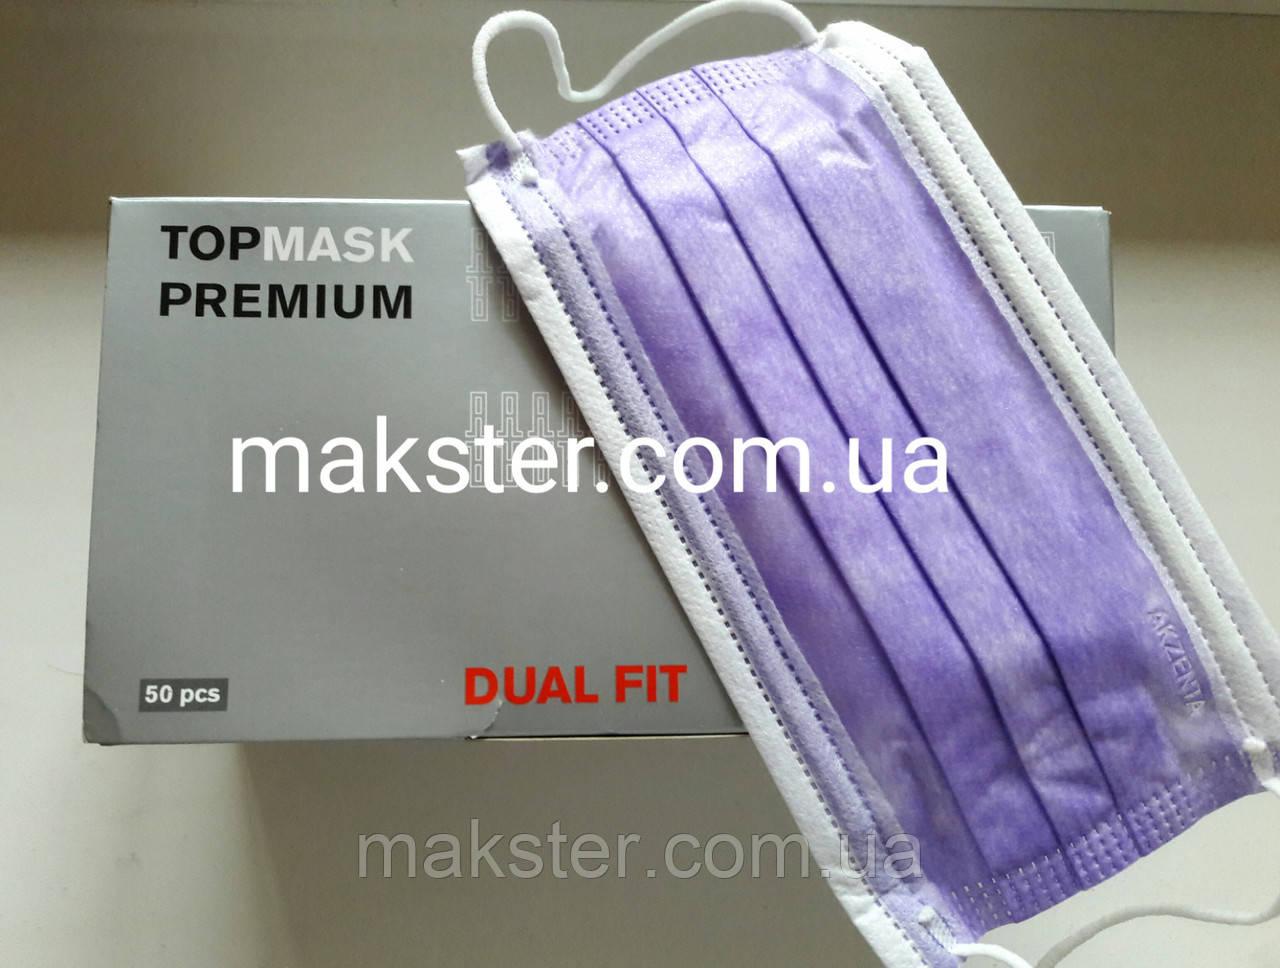 Маски медицинские Akzenta Top Mask Premium лиловые